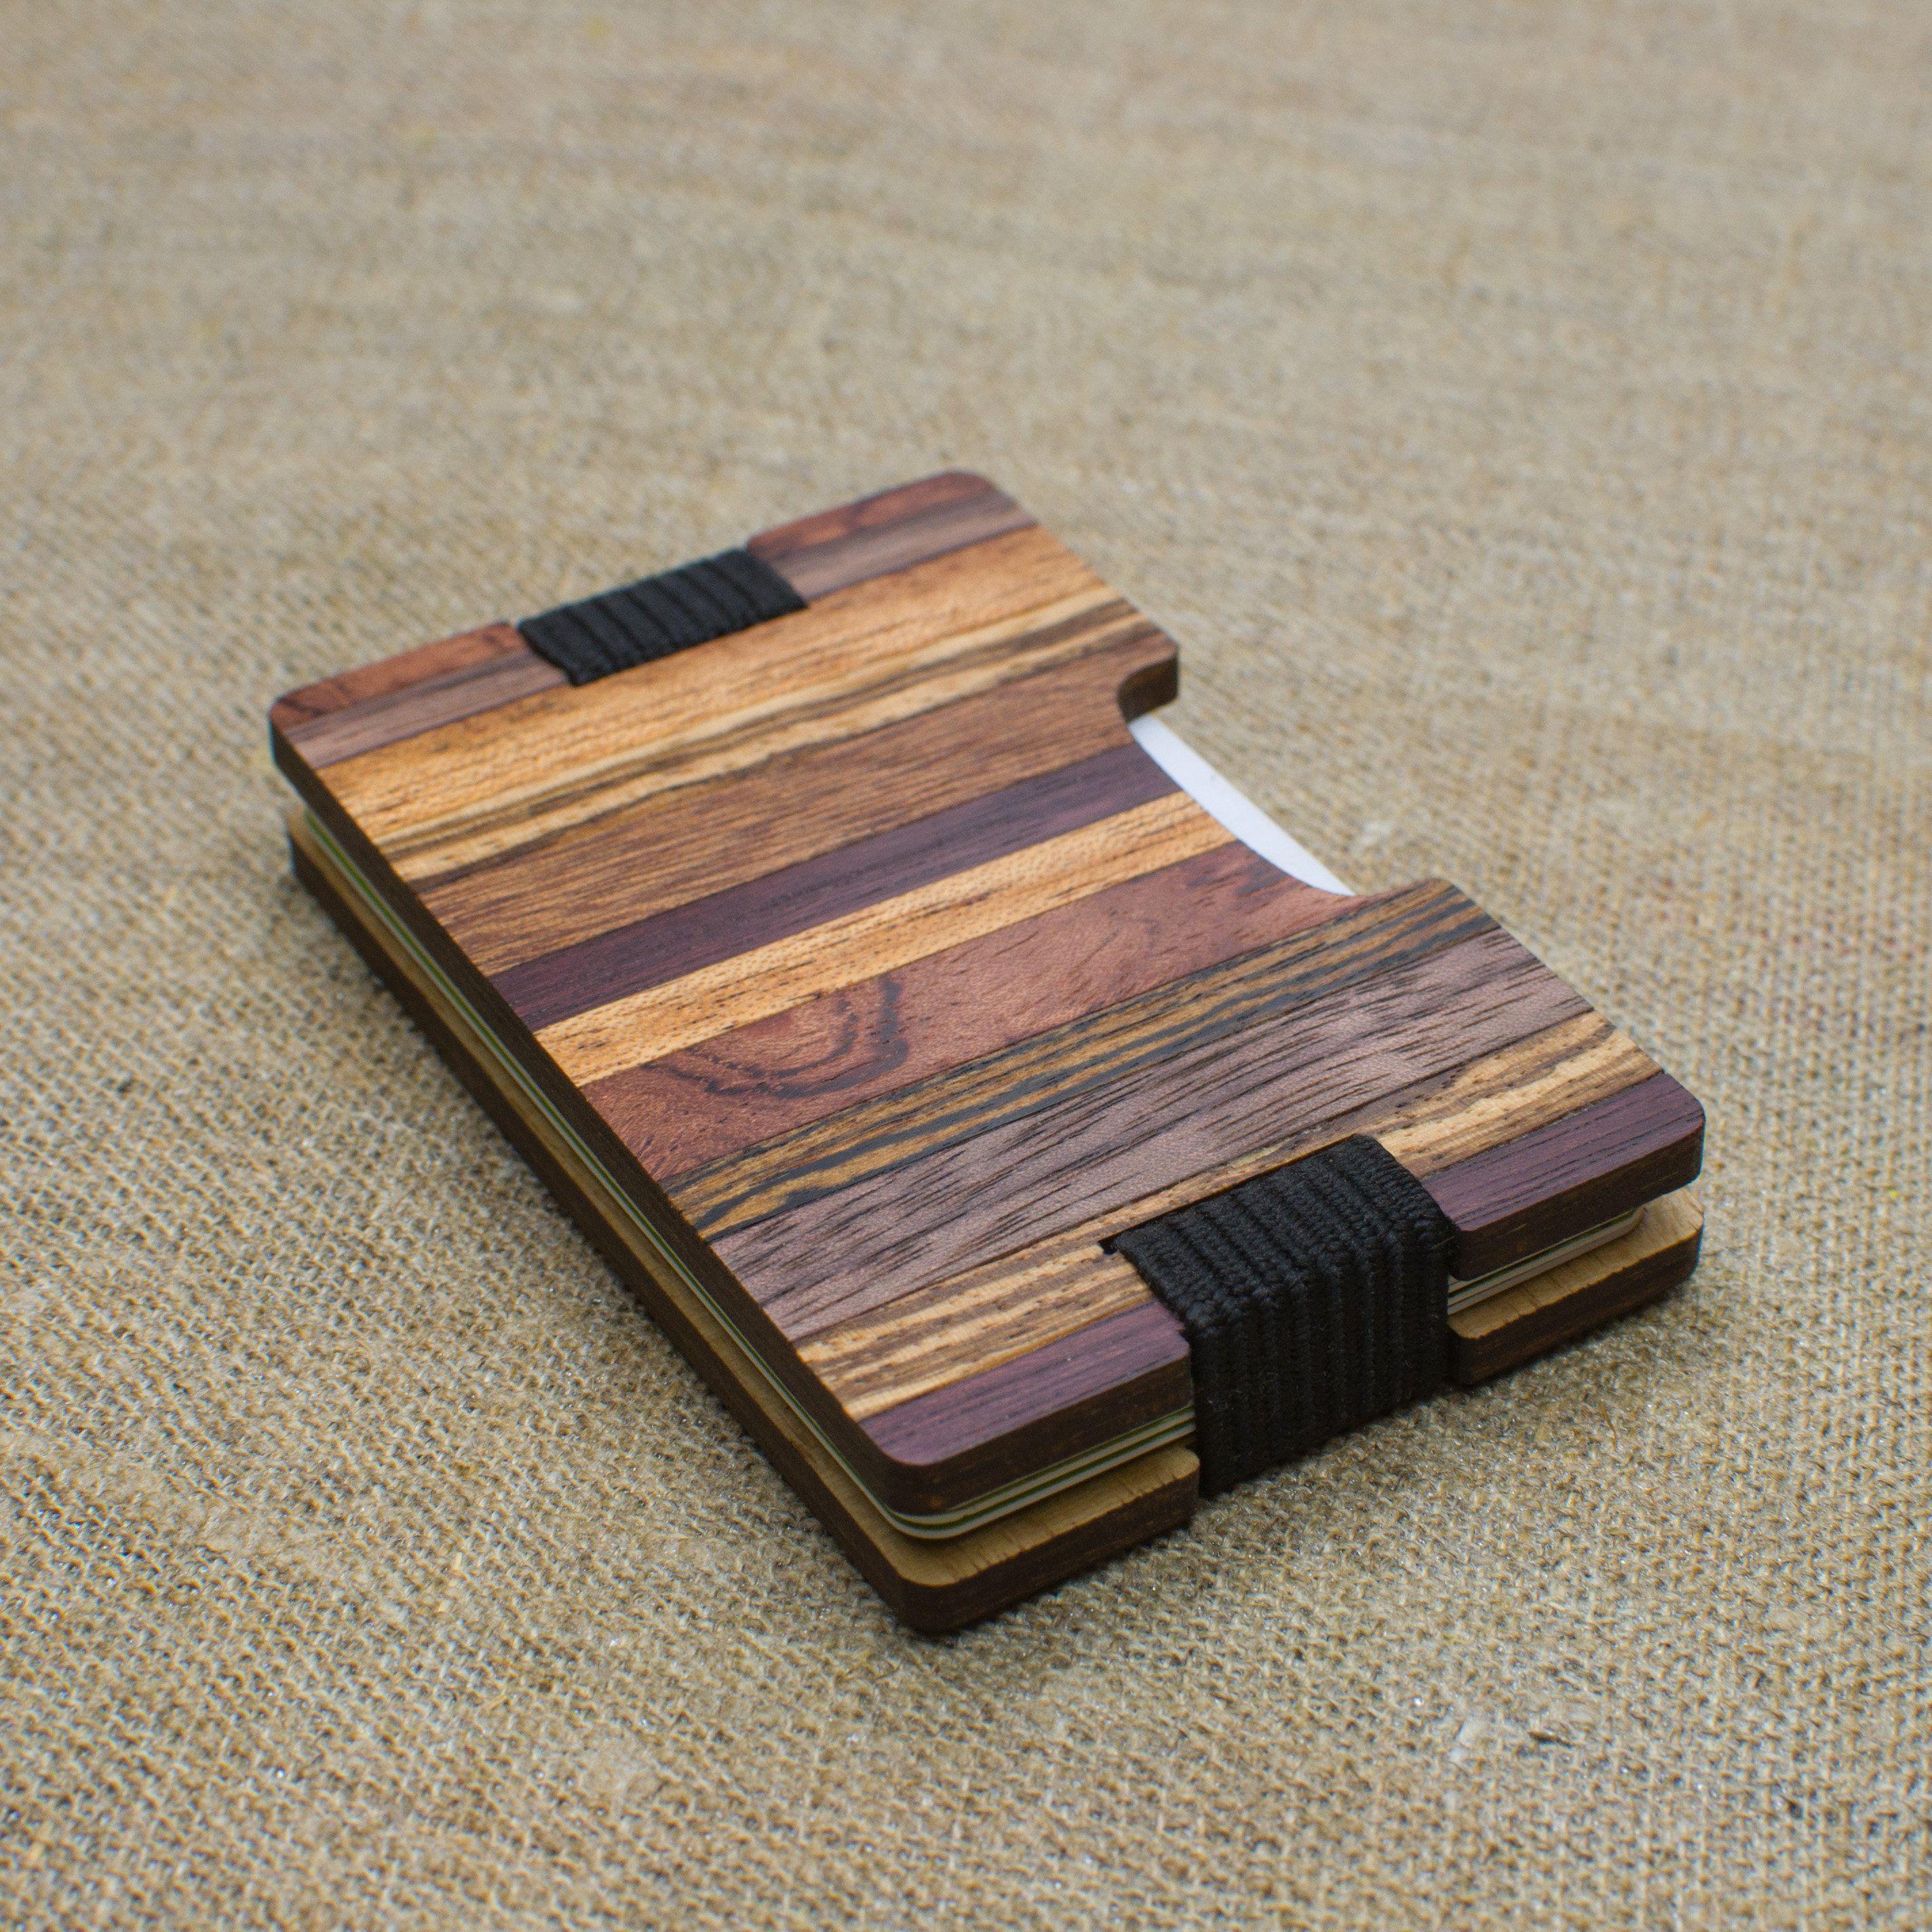 Http Etsy Me 2d0sjqy Handmade Wooden Wallet Credit Card Holder Minimalistic Koshelyok Dlya Plastikovyh Kart I Kupyur Iz Wood Wallet Wood Working Gifts Wooden Bag